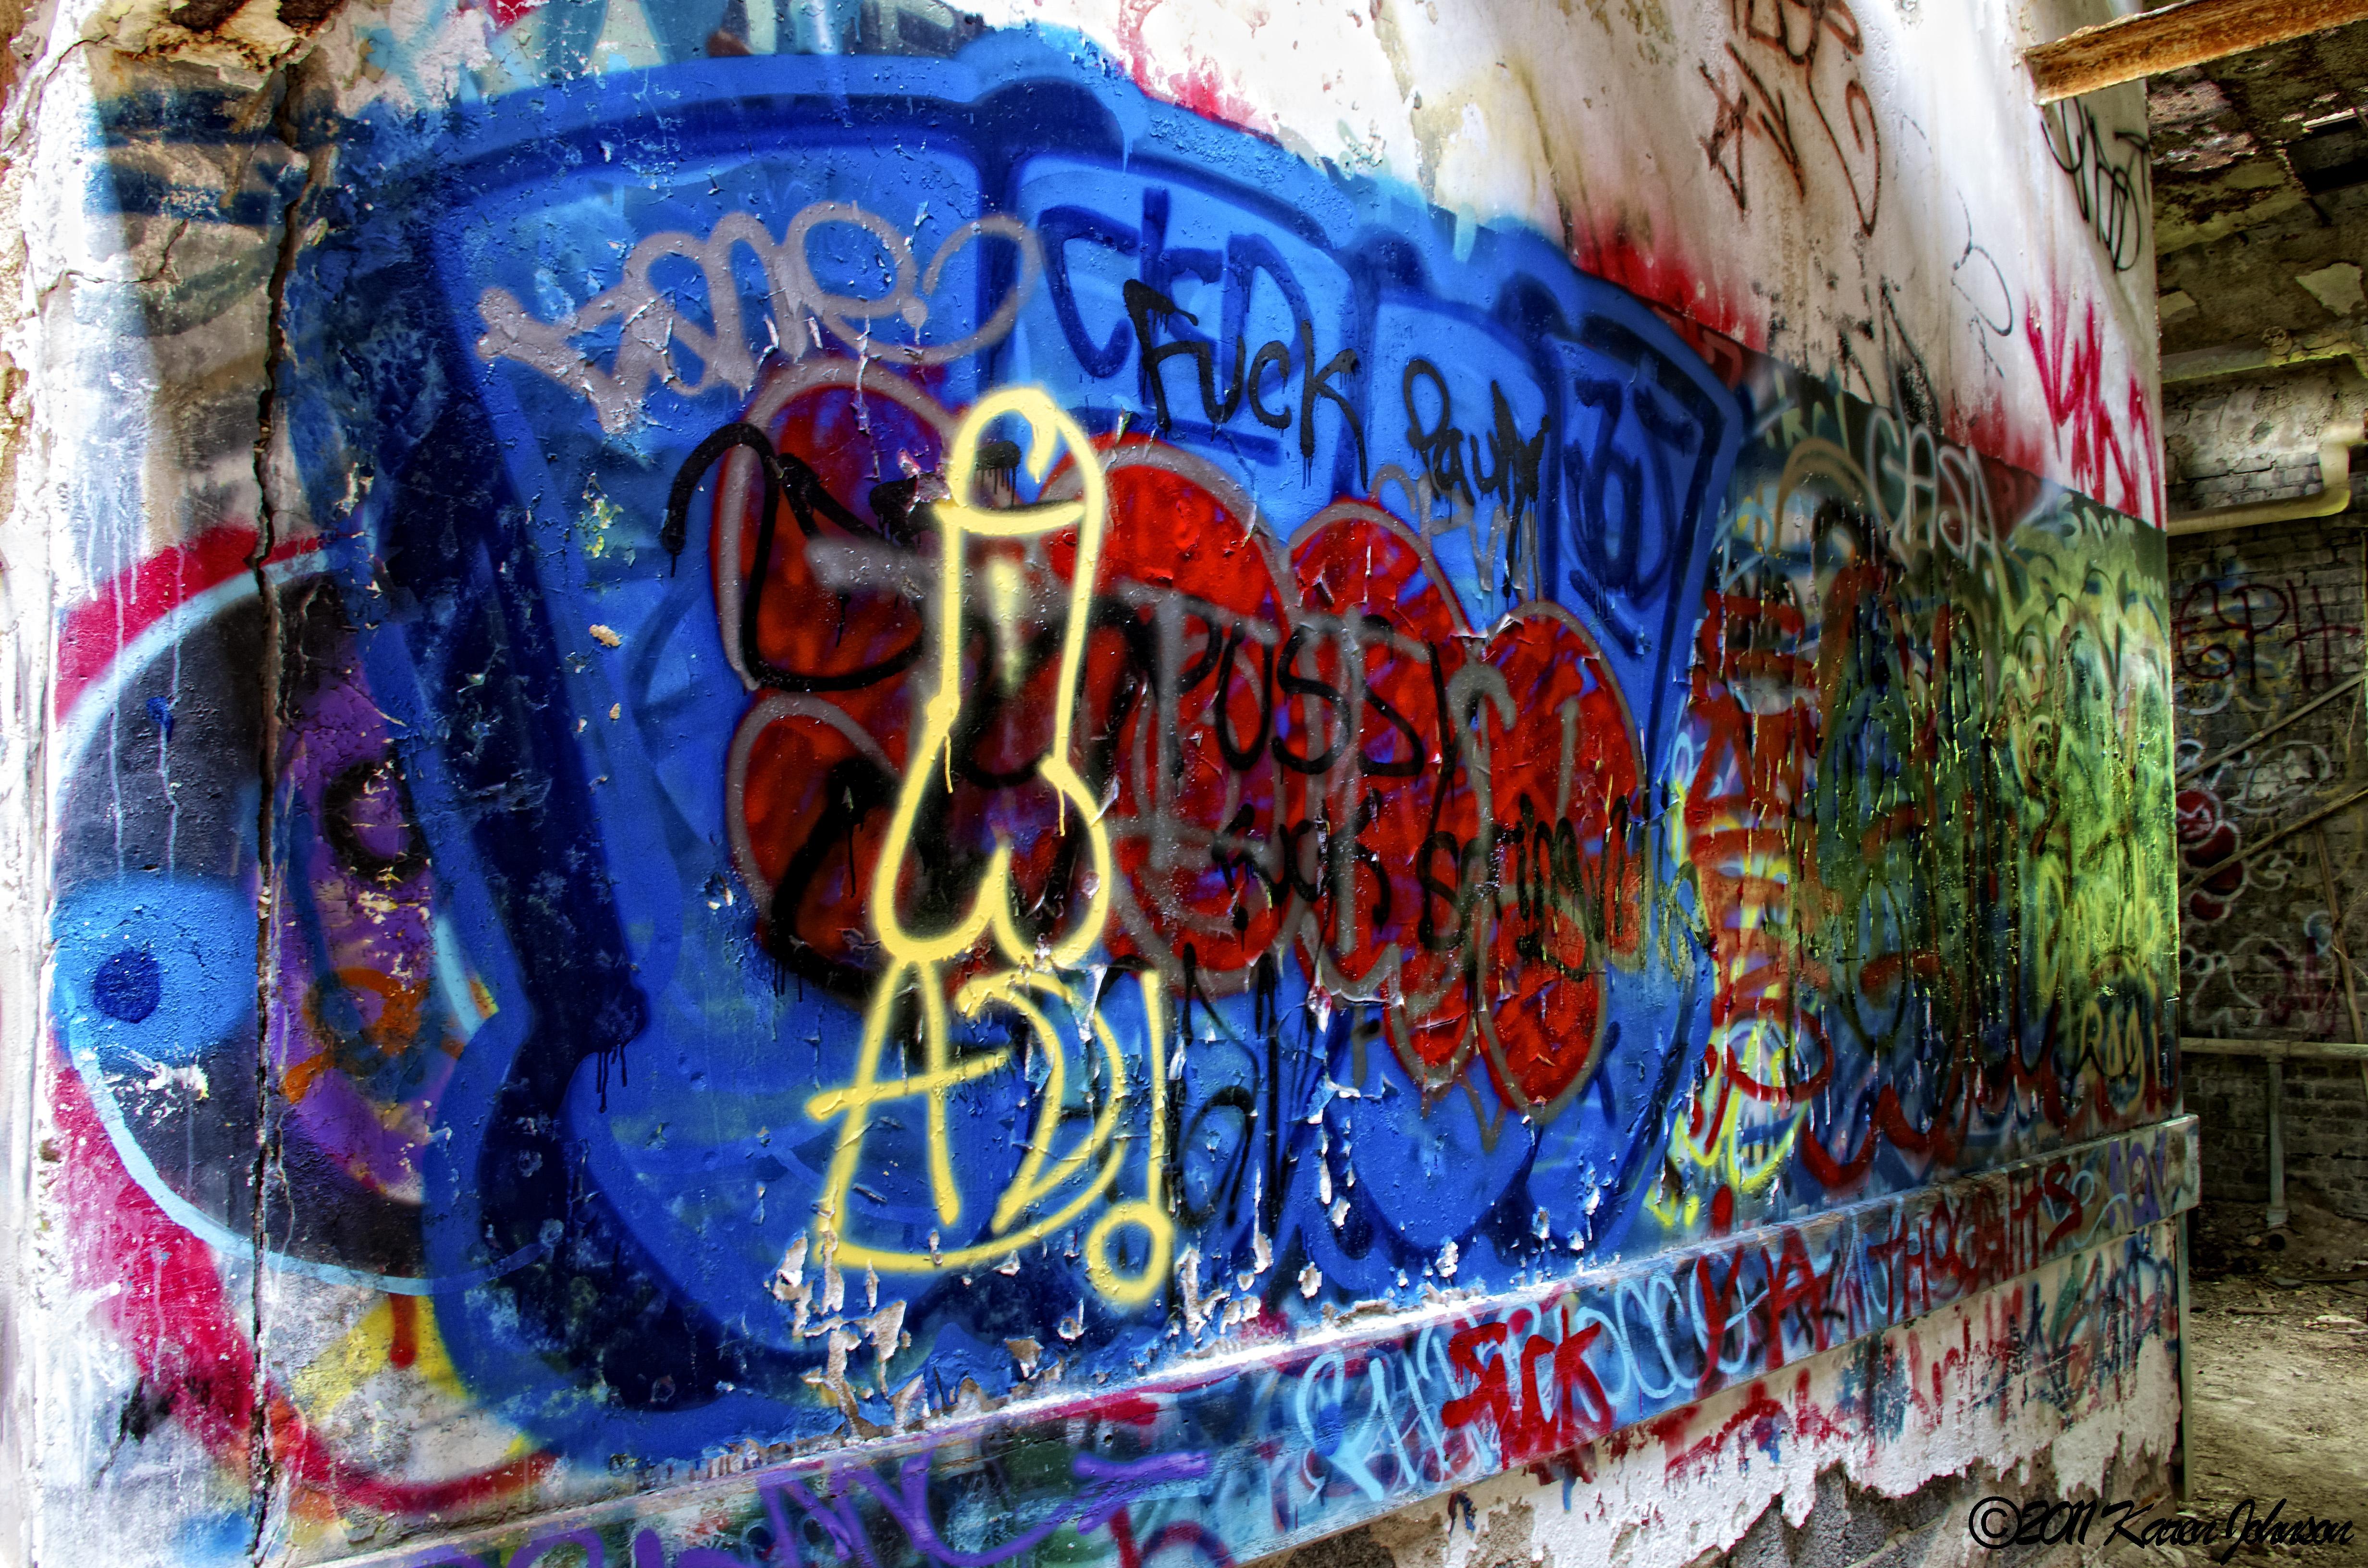 Grafiti wall red - Filename Red Blue Graffiti Wall Jpg